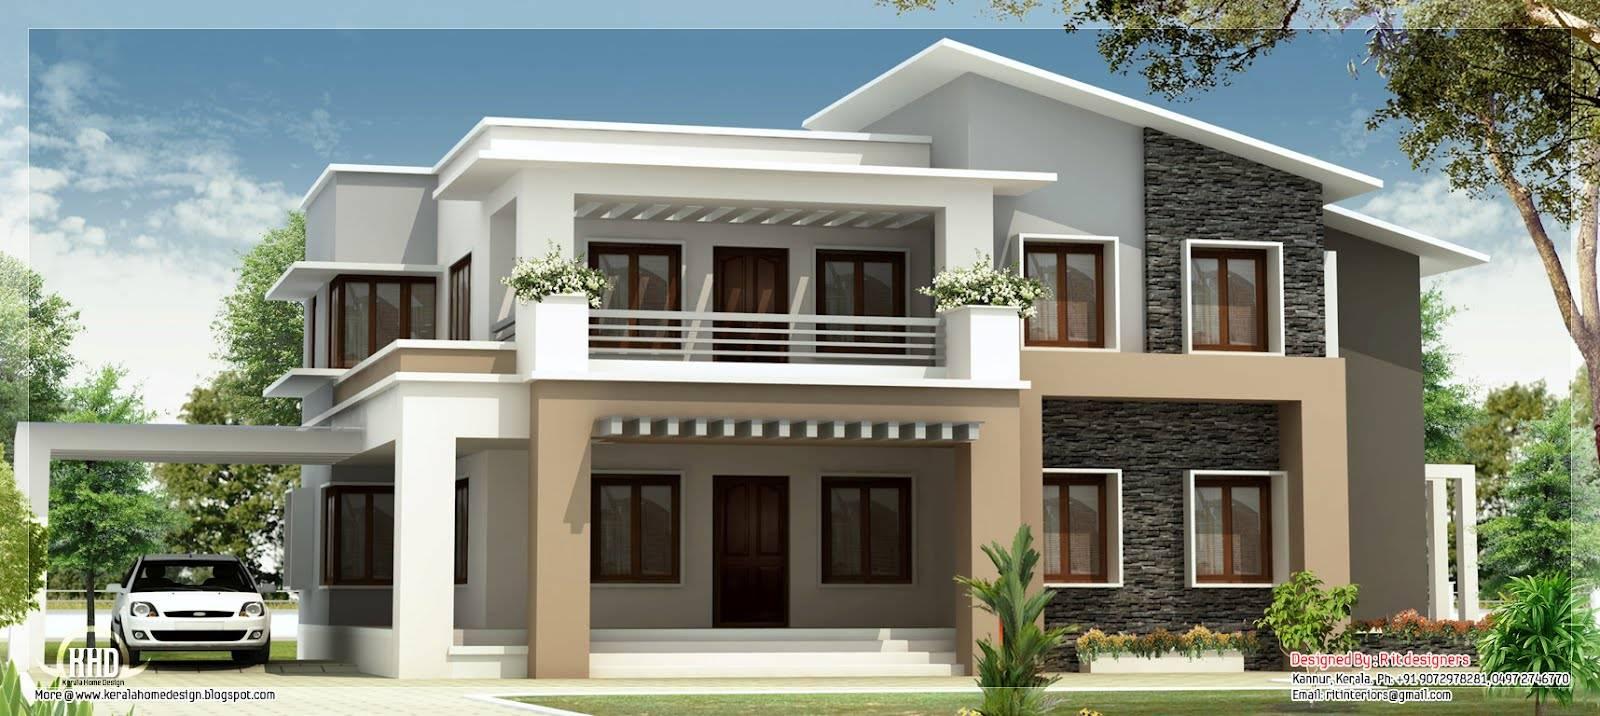 Modern Mix Double Floor Home Design Indian House Plans House Plans 37069